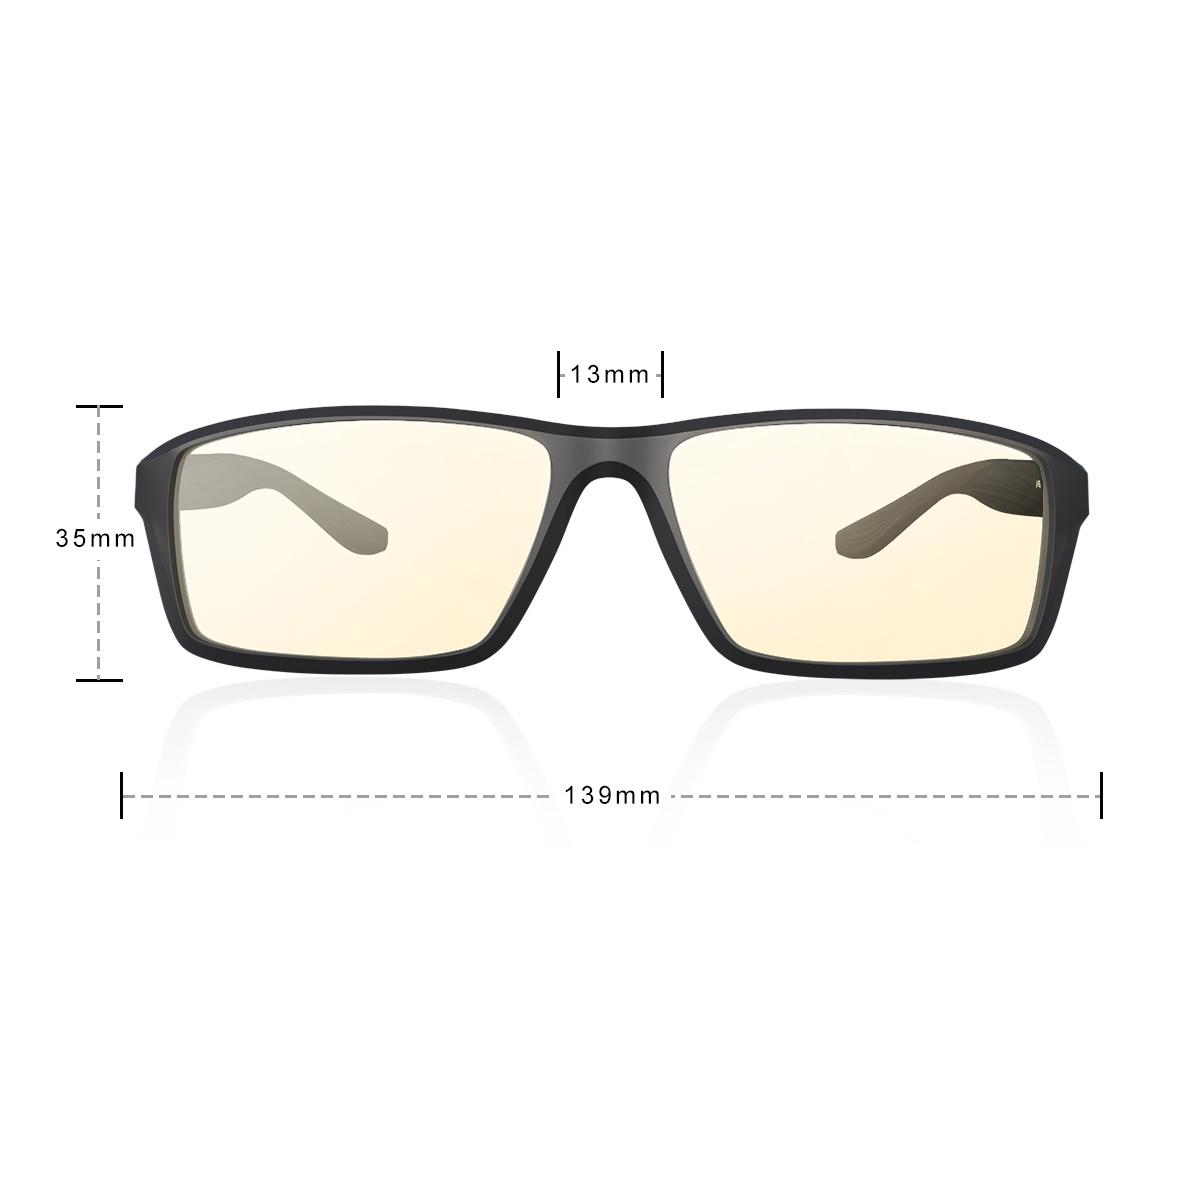 Velocifire VG2 Blue Light-Blocking Computer Glasses Unisex  $11.99 + FS